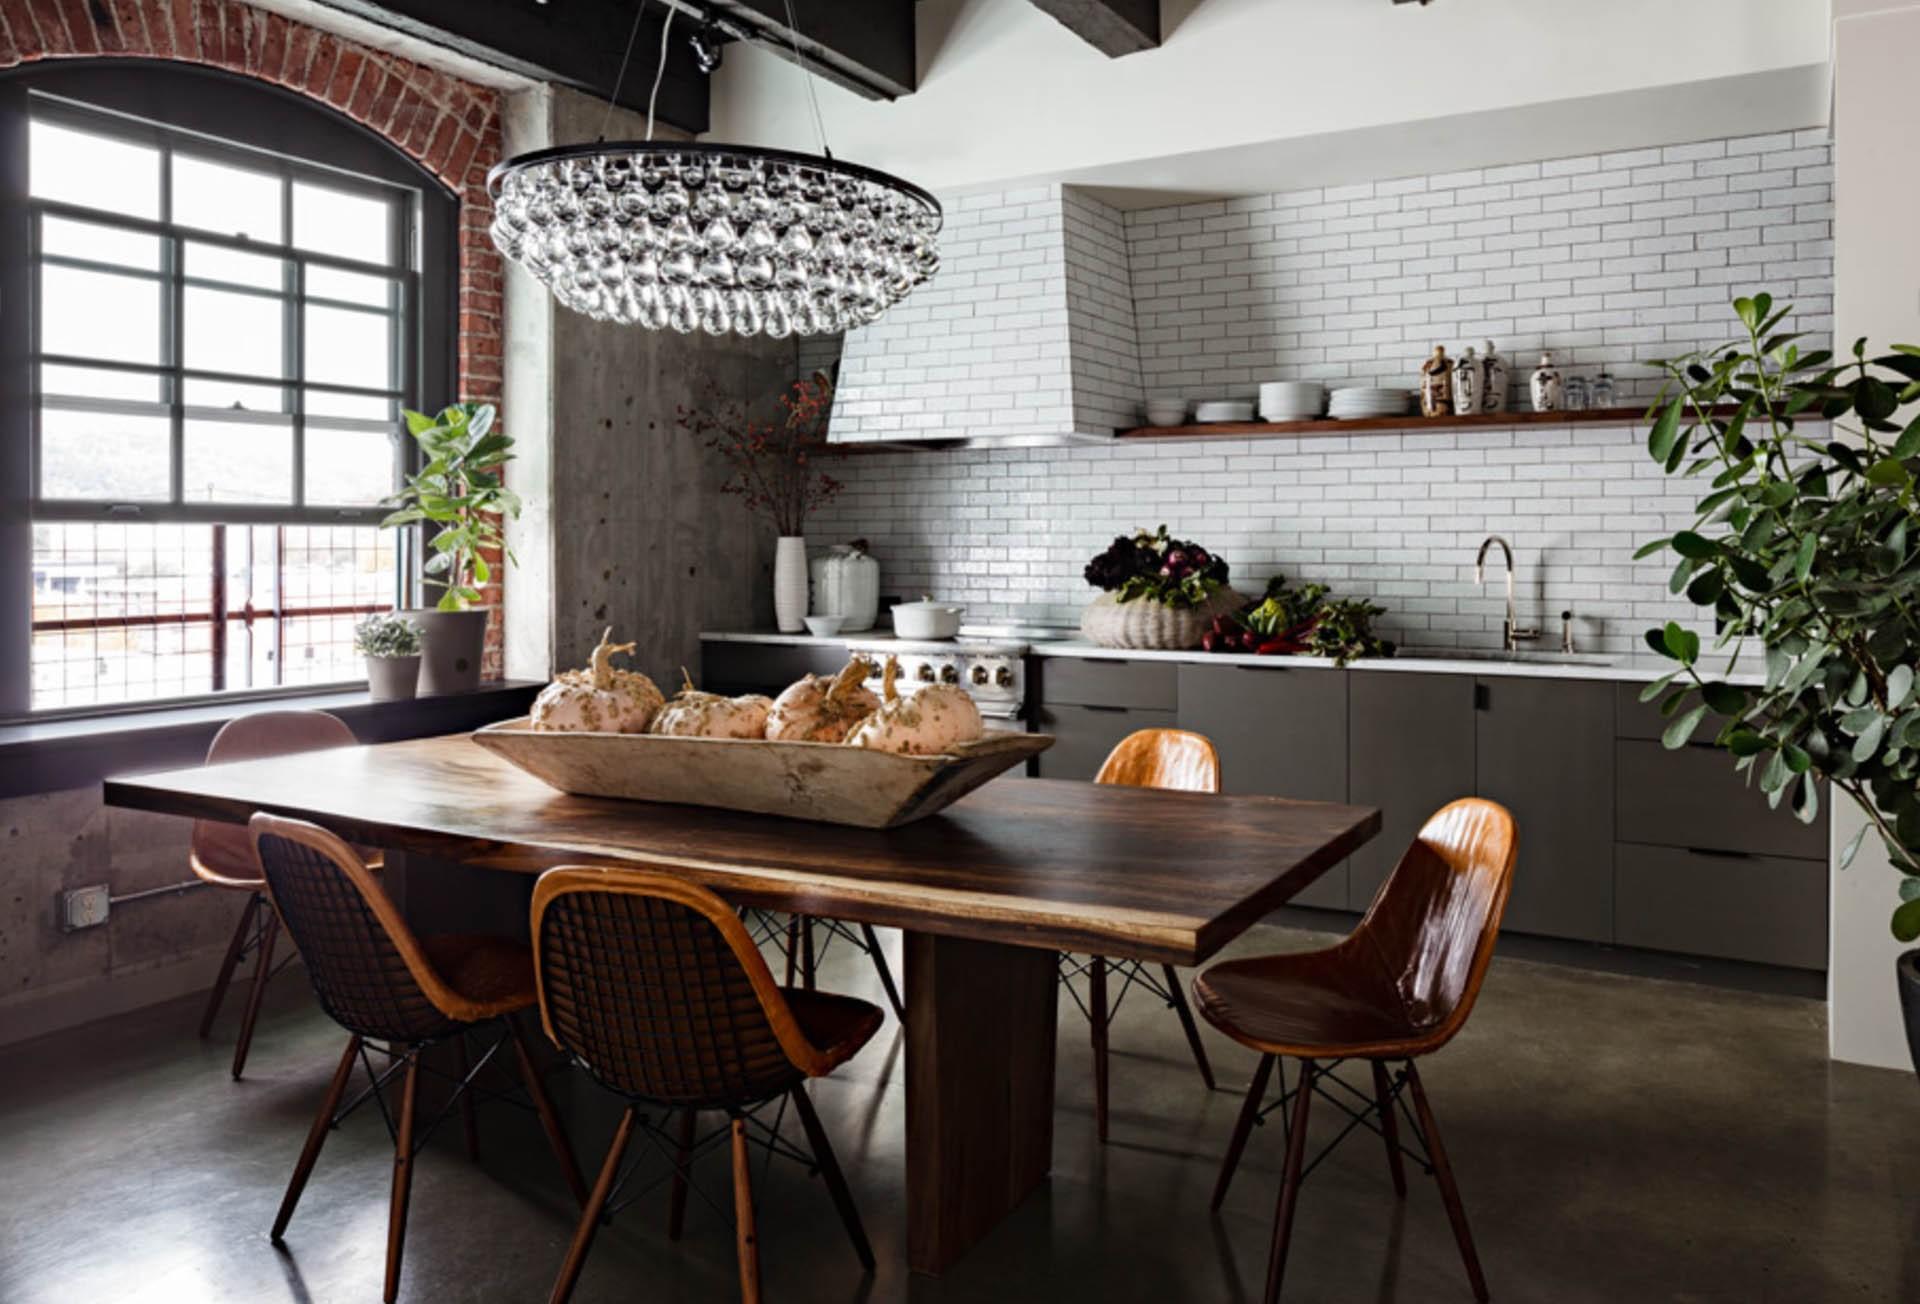 Lessentiel dune cuisine de style loft  Diaporama Photo